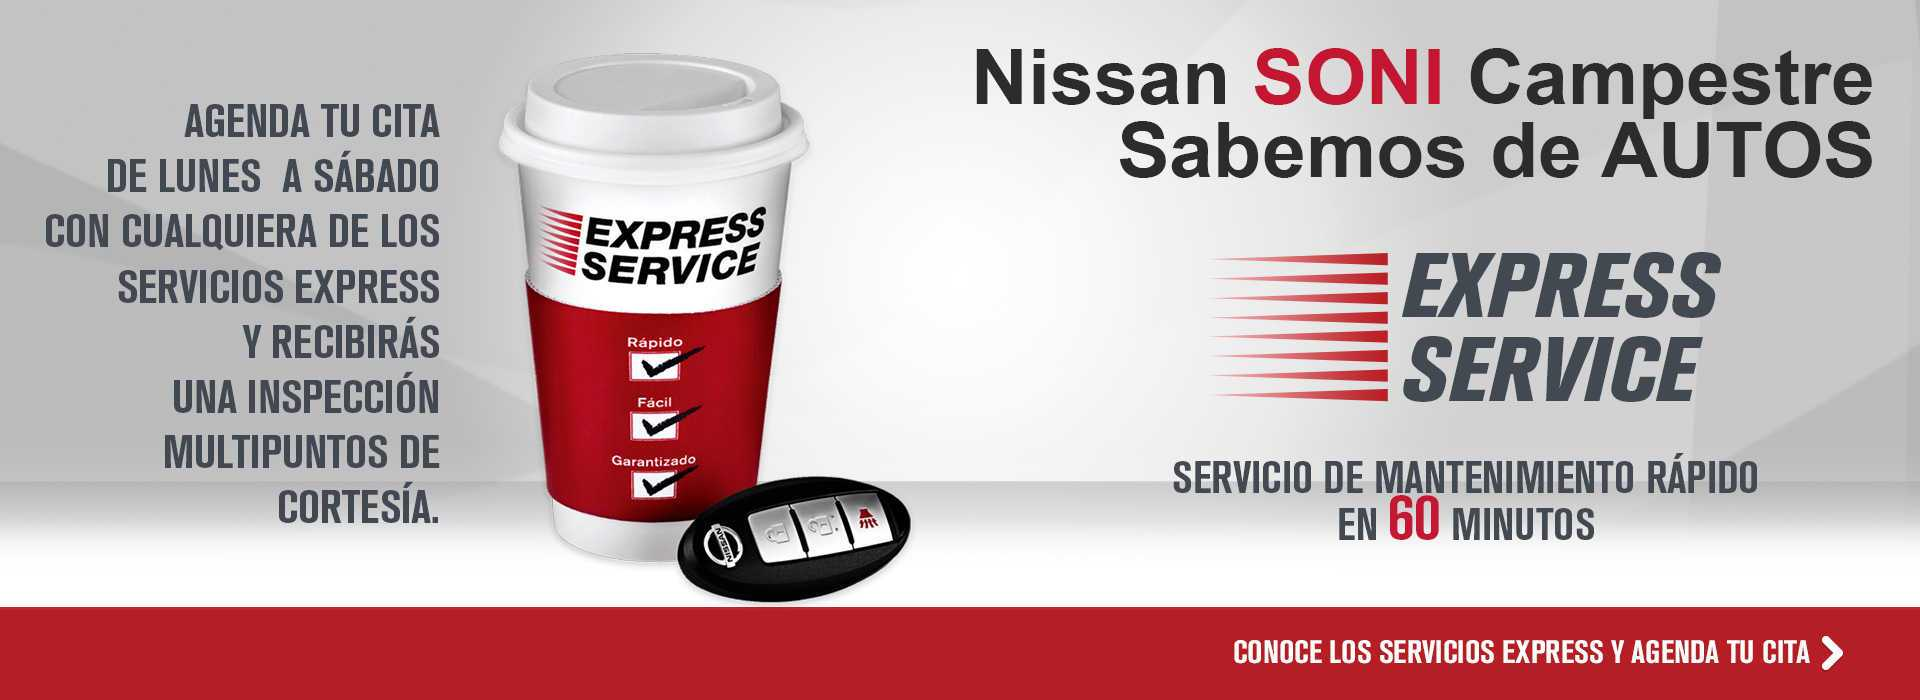 Agenda tu cita de Servicio Express